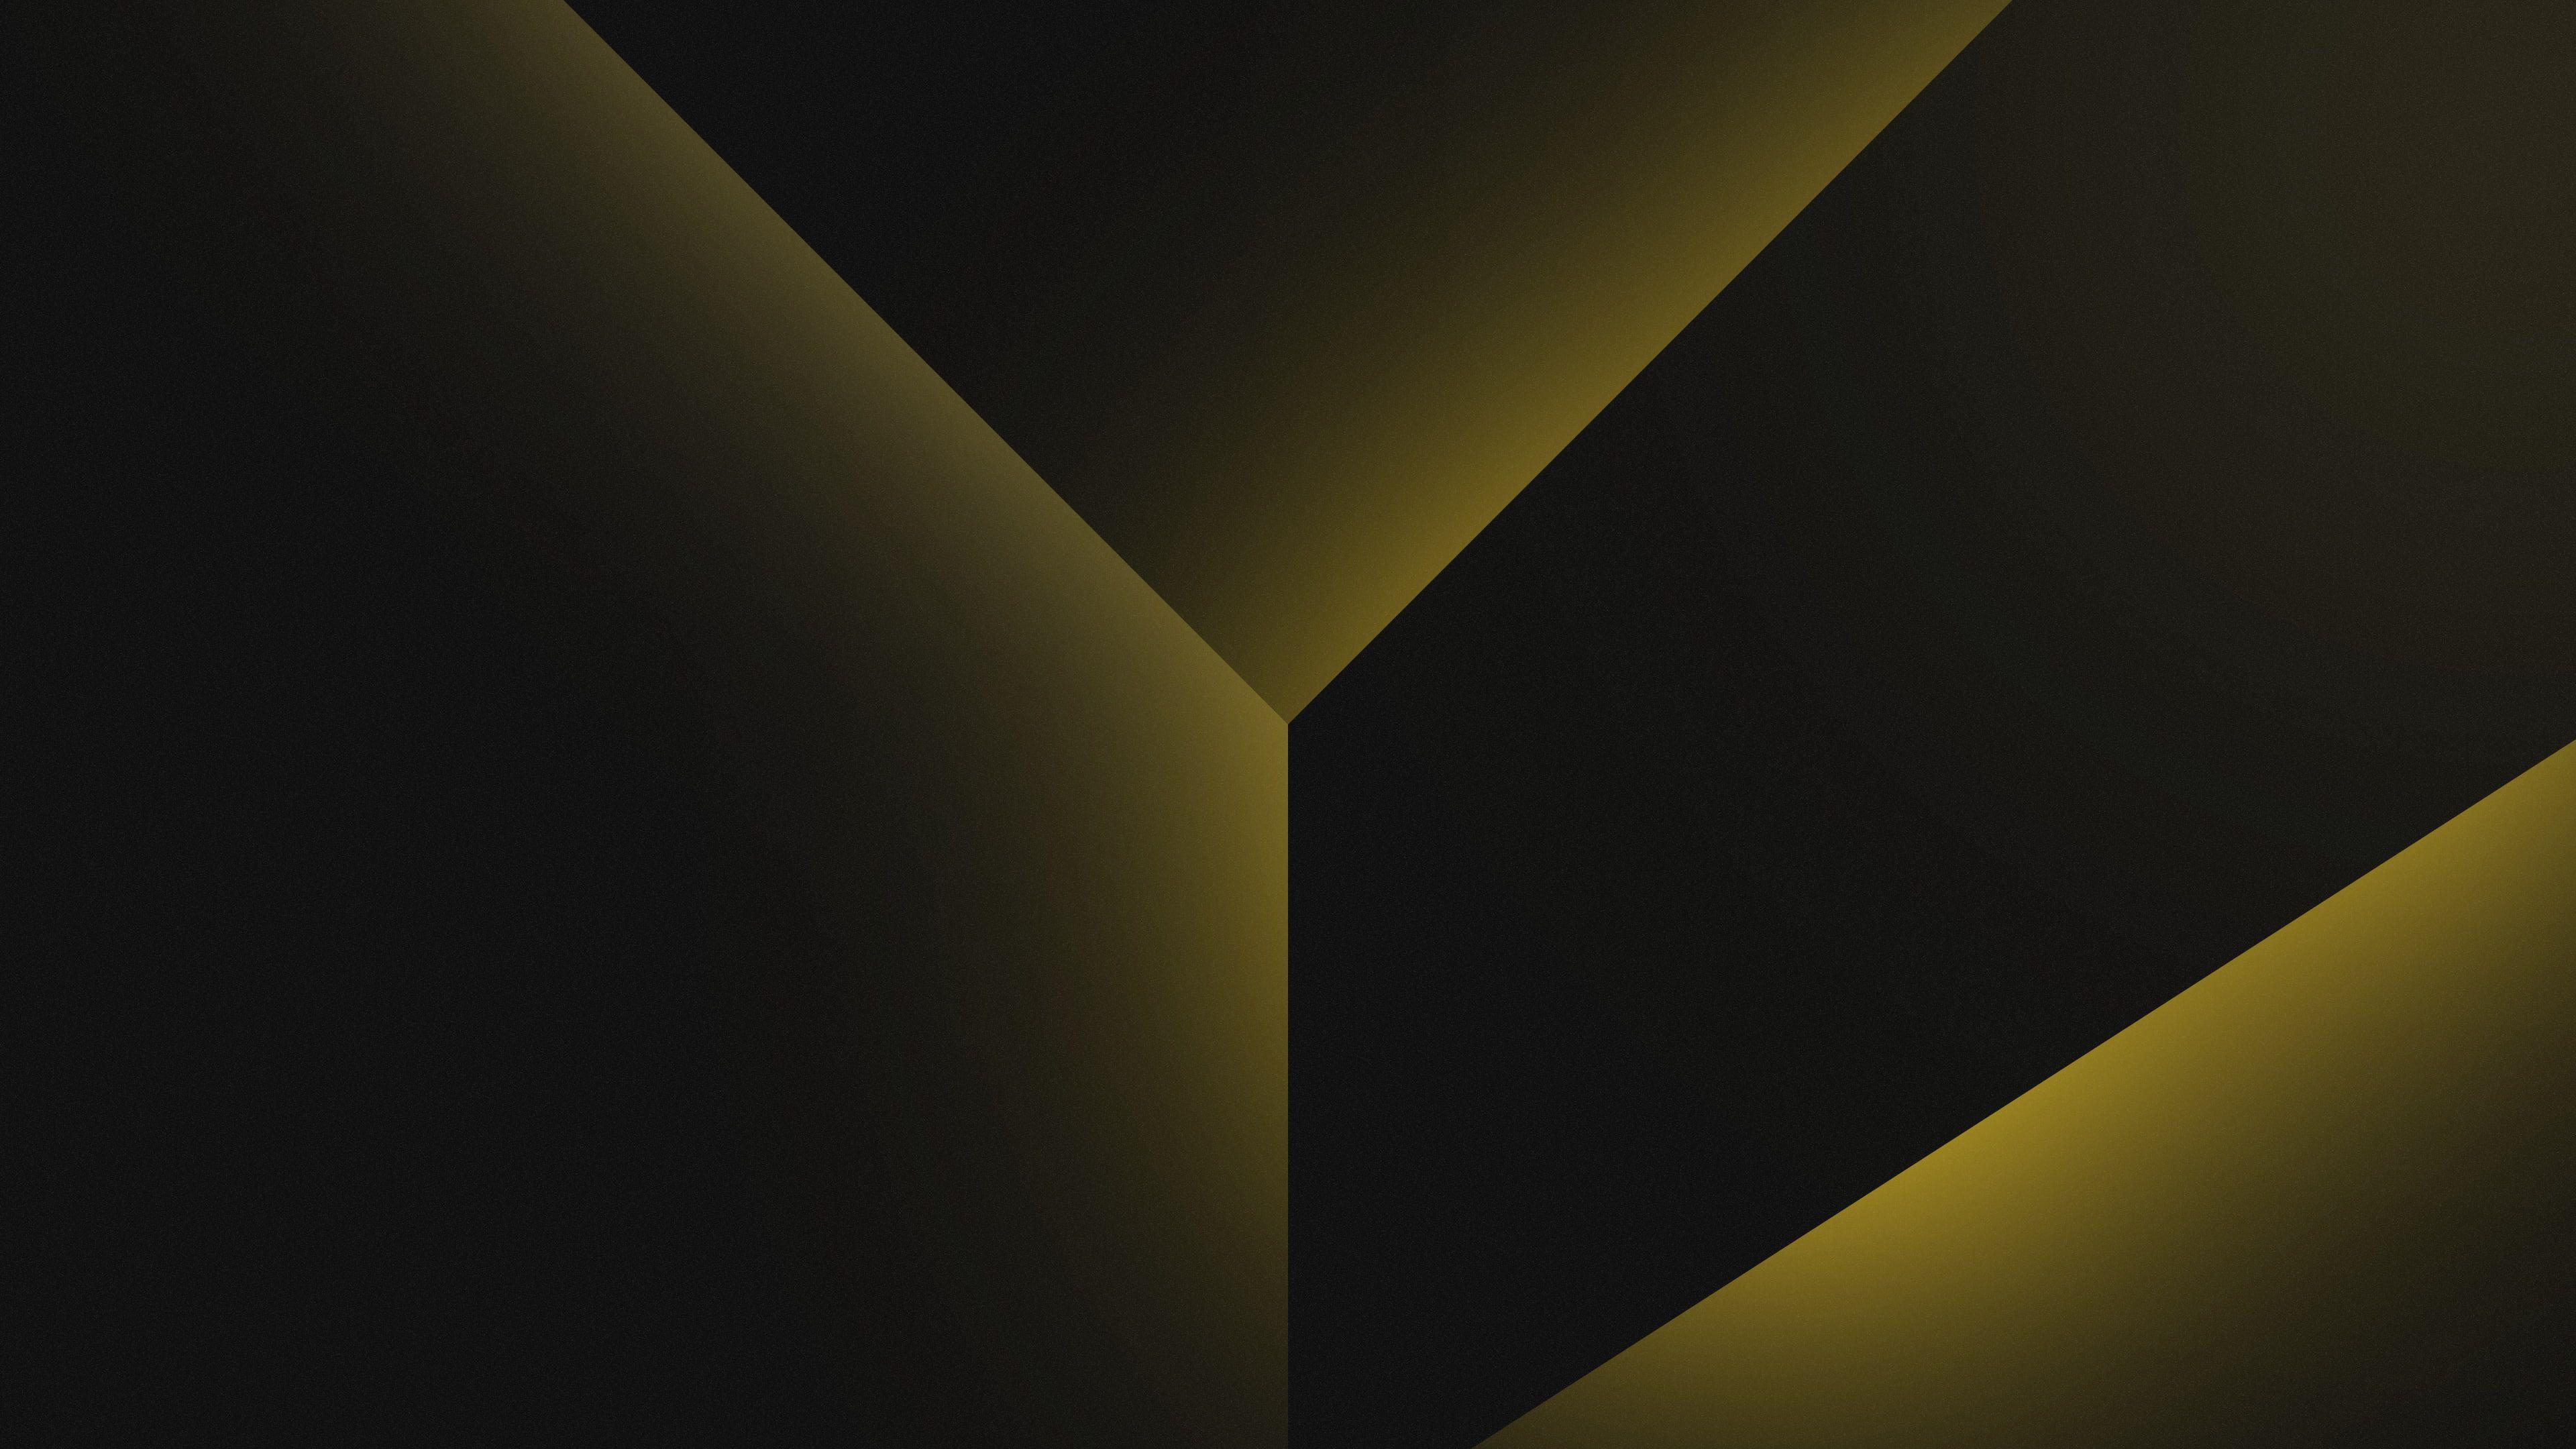 Geometric Gradient Black Yellow Shapes Dark Background 4k 4k Wallpaper Hdwallpaper Deskto Abstract Wallpaper Dark Wallpaper Dark Background Wallpaper